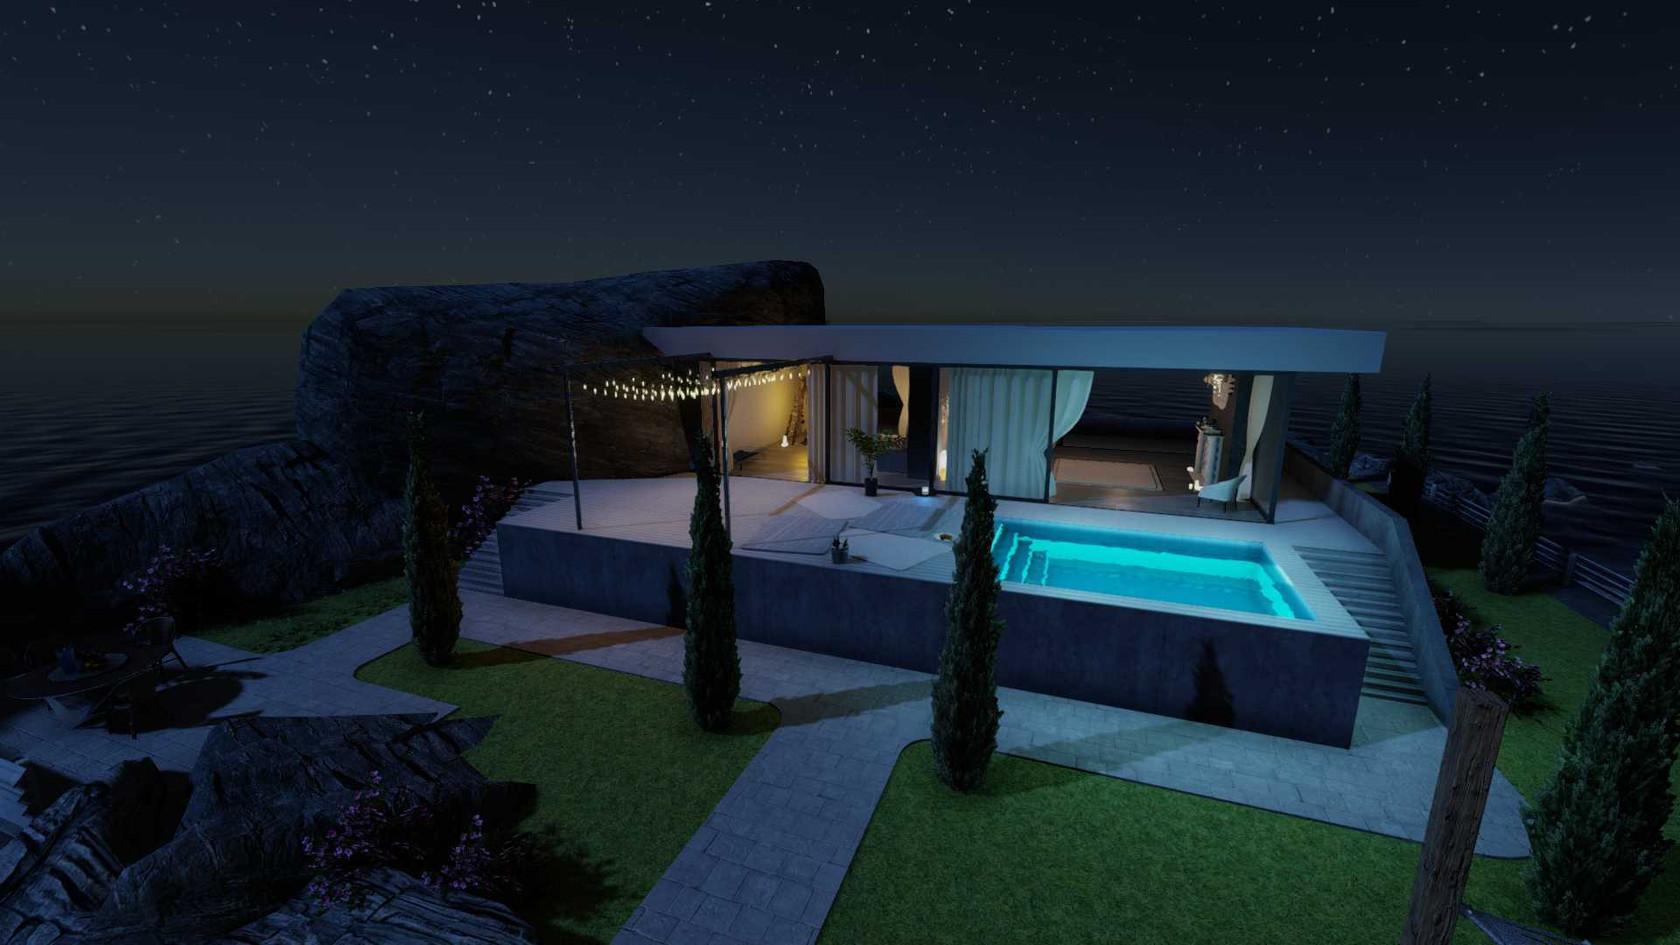 Home by Redji & Manyasha